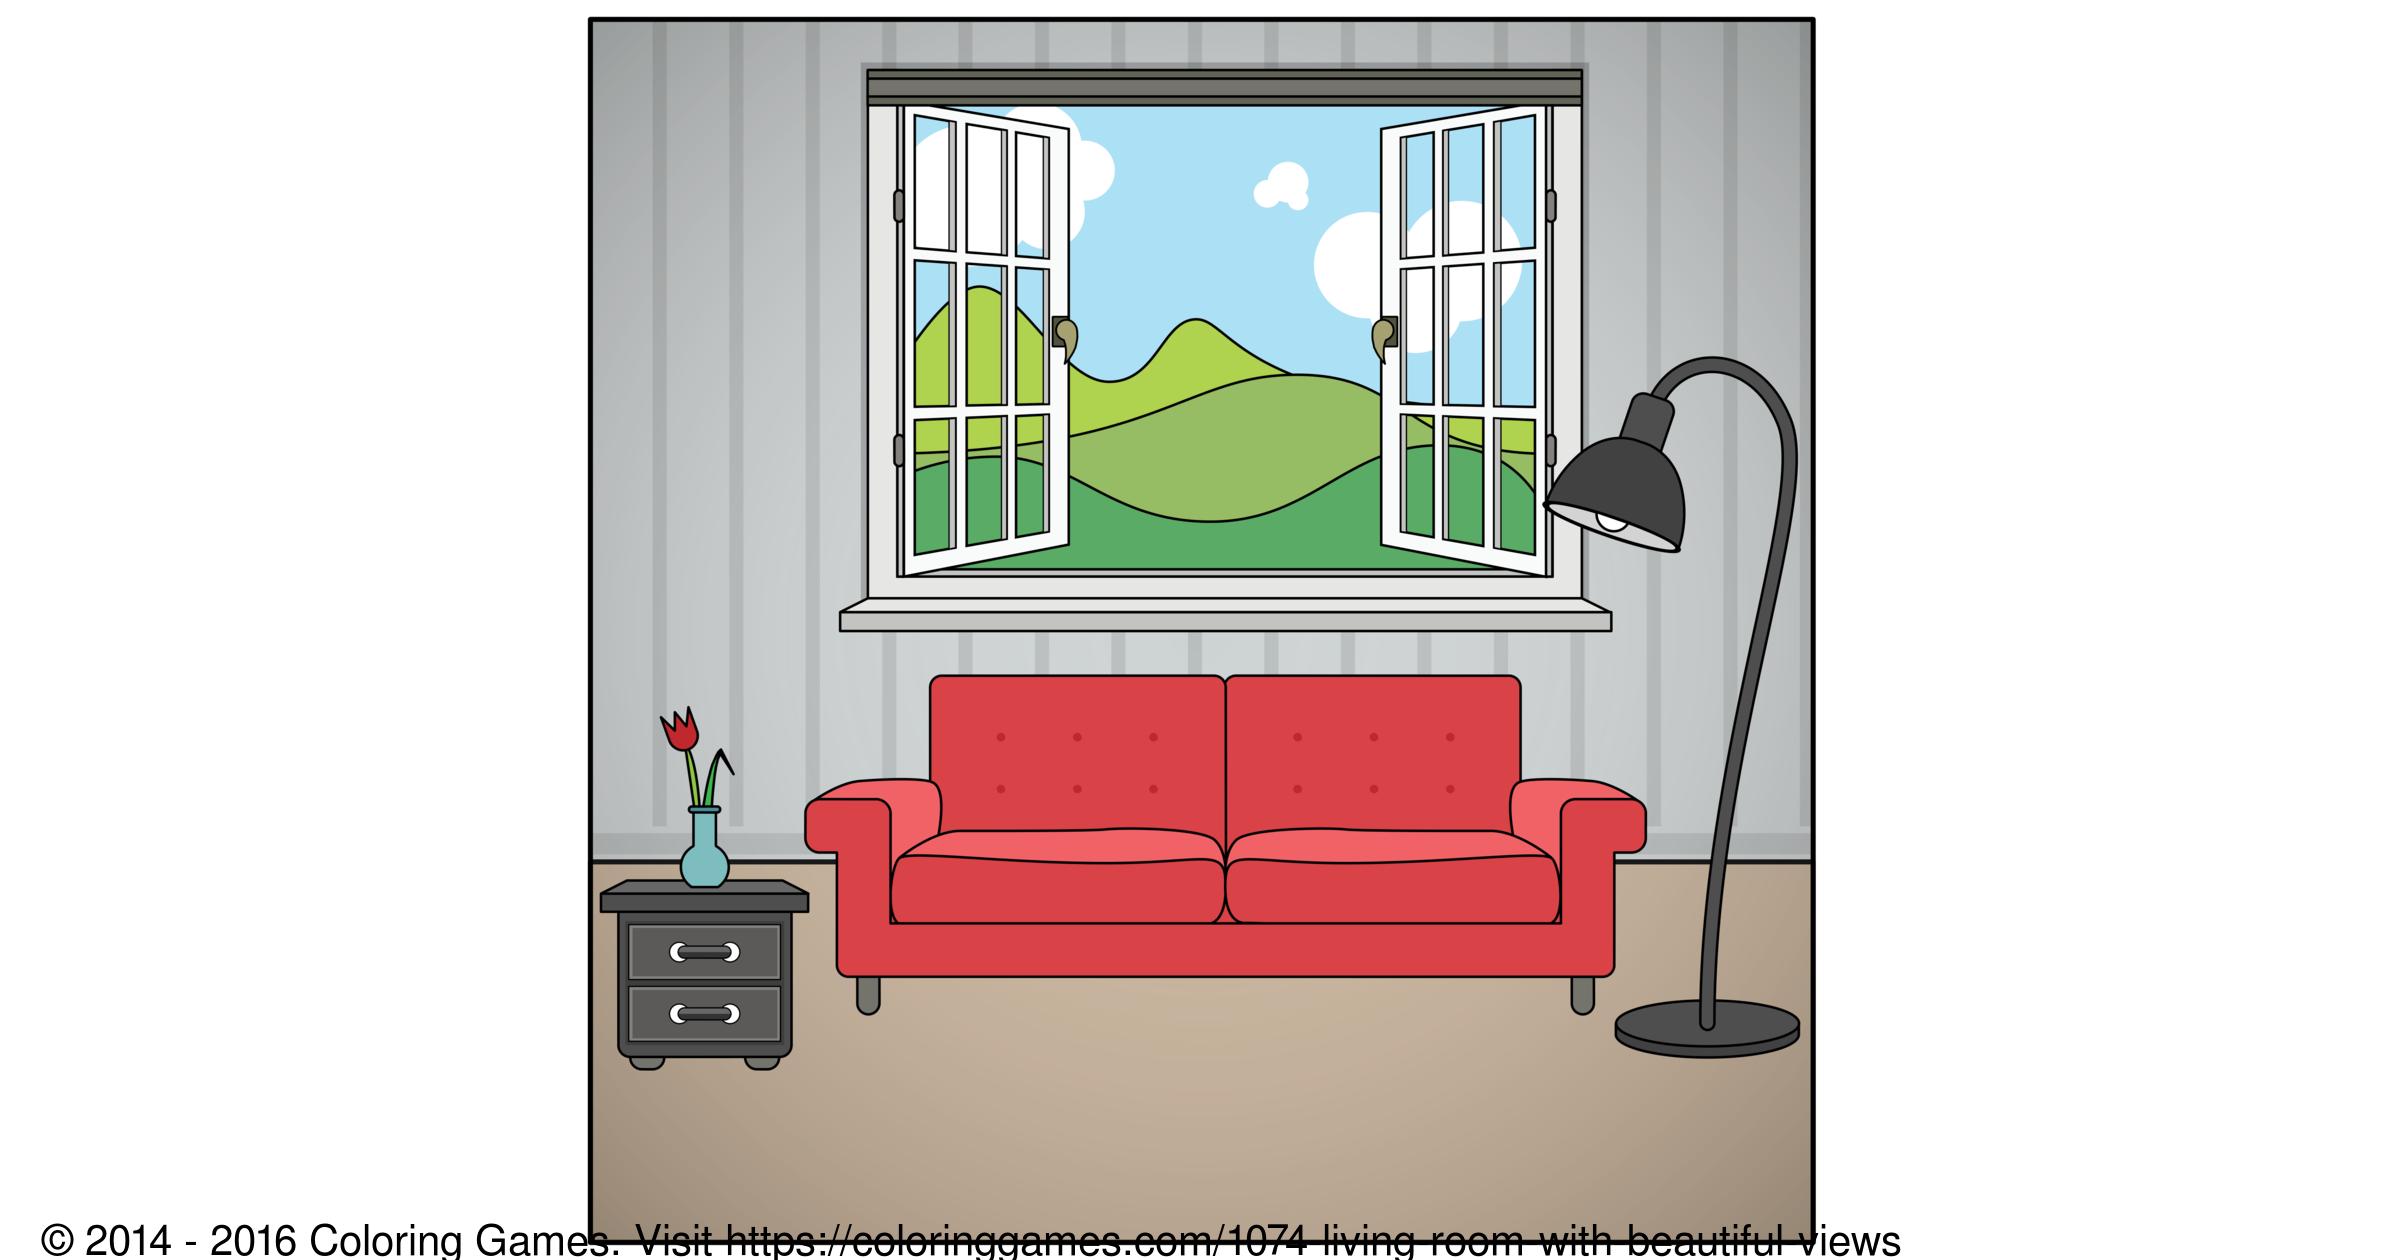 Living room coloring page - Living Room Coloring Page 59